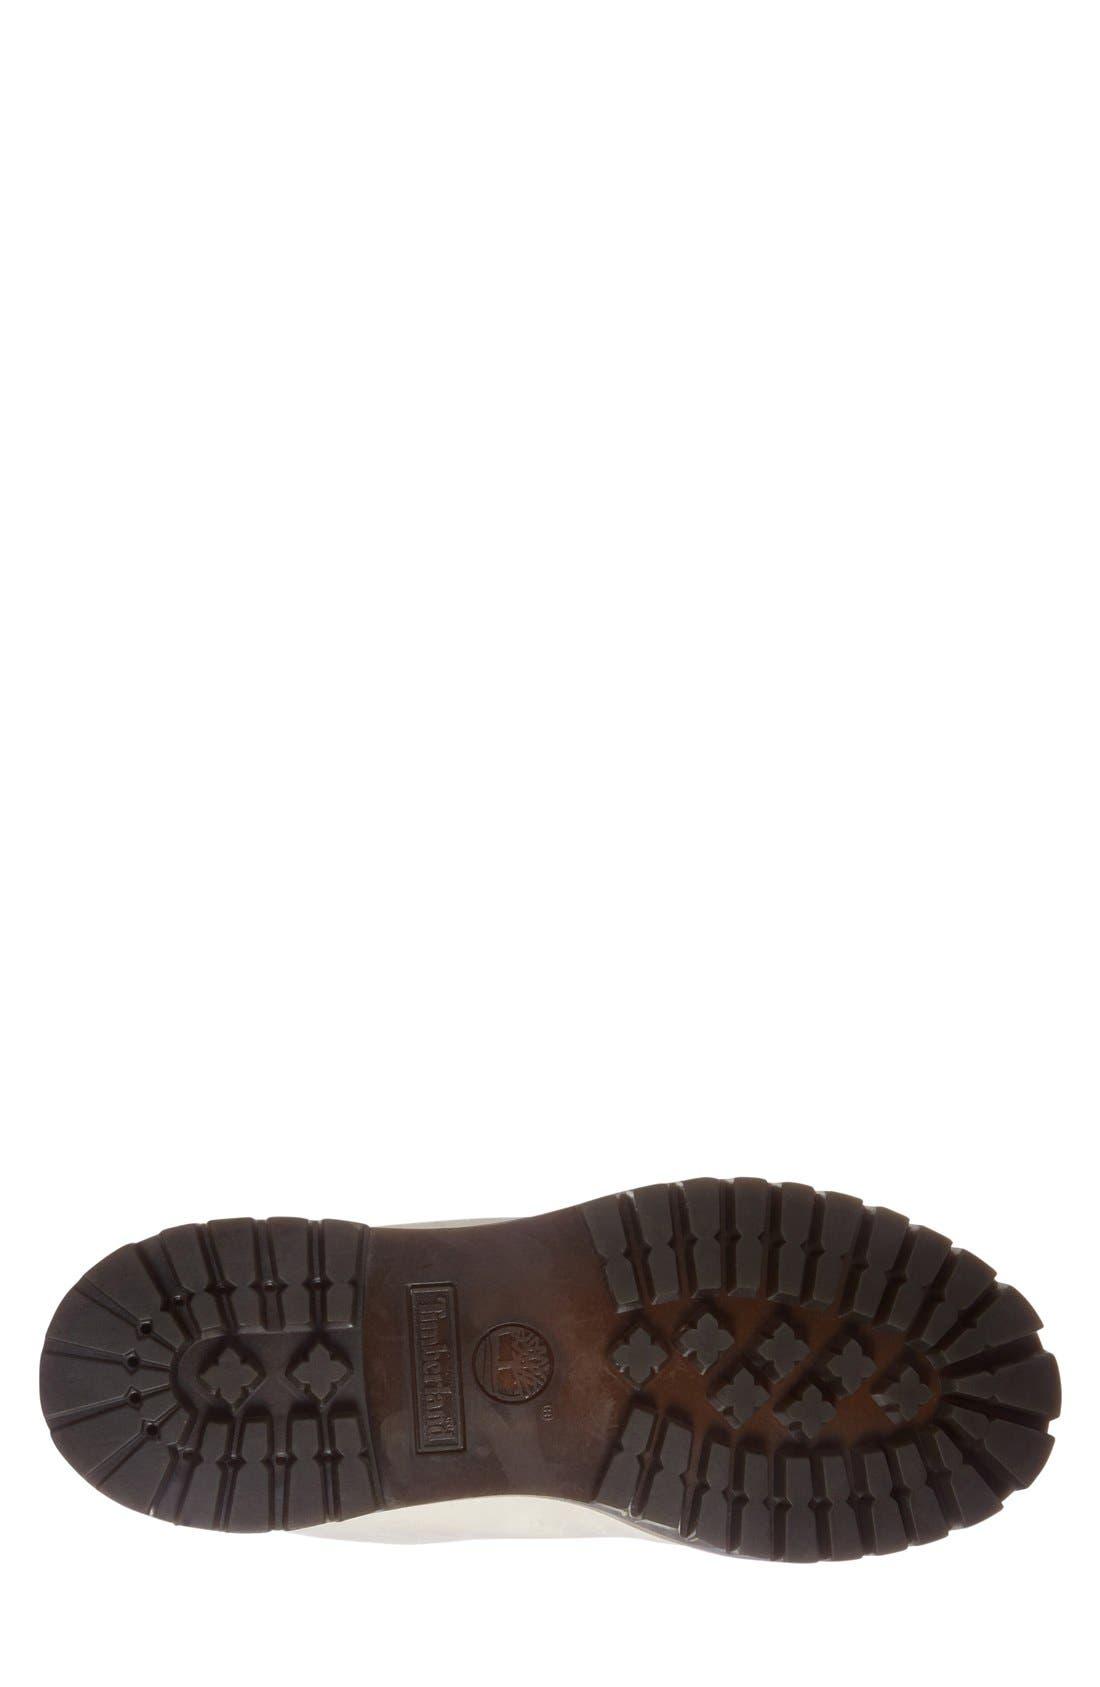 Alternate Image 2  - Timberland 'Premium Tone on Tone' Waterproof Boot (Men)